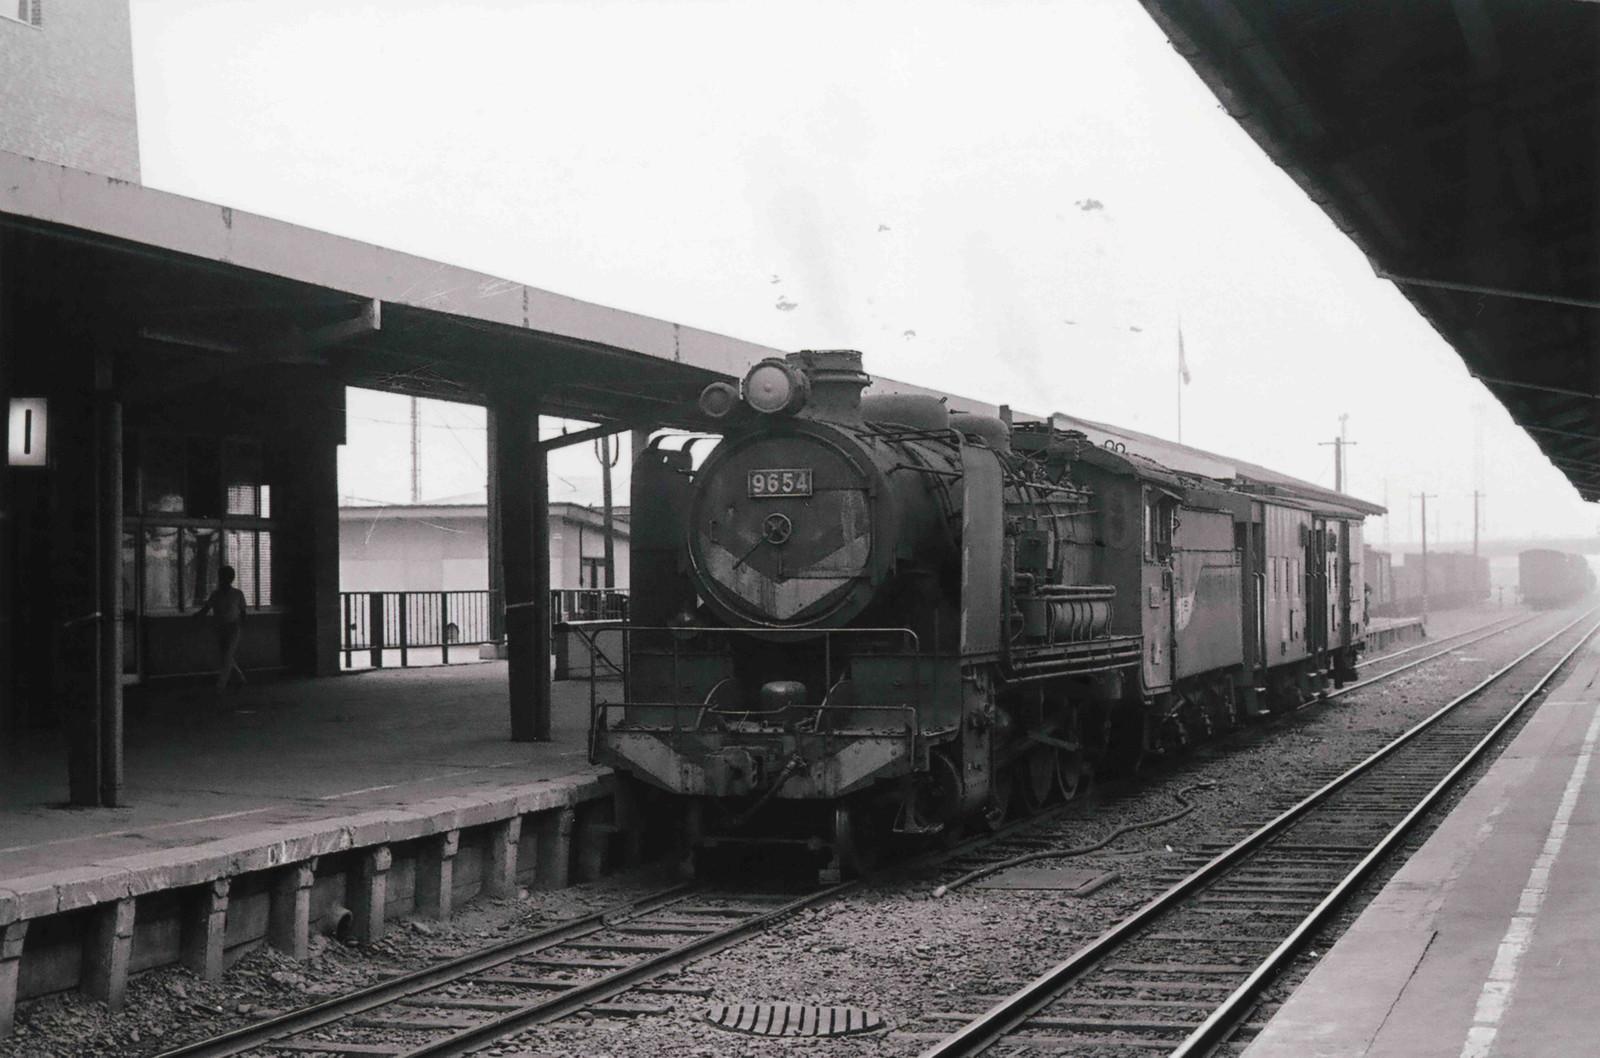 19728004